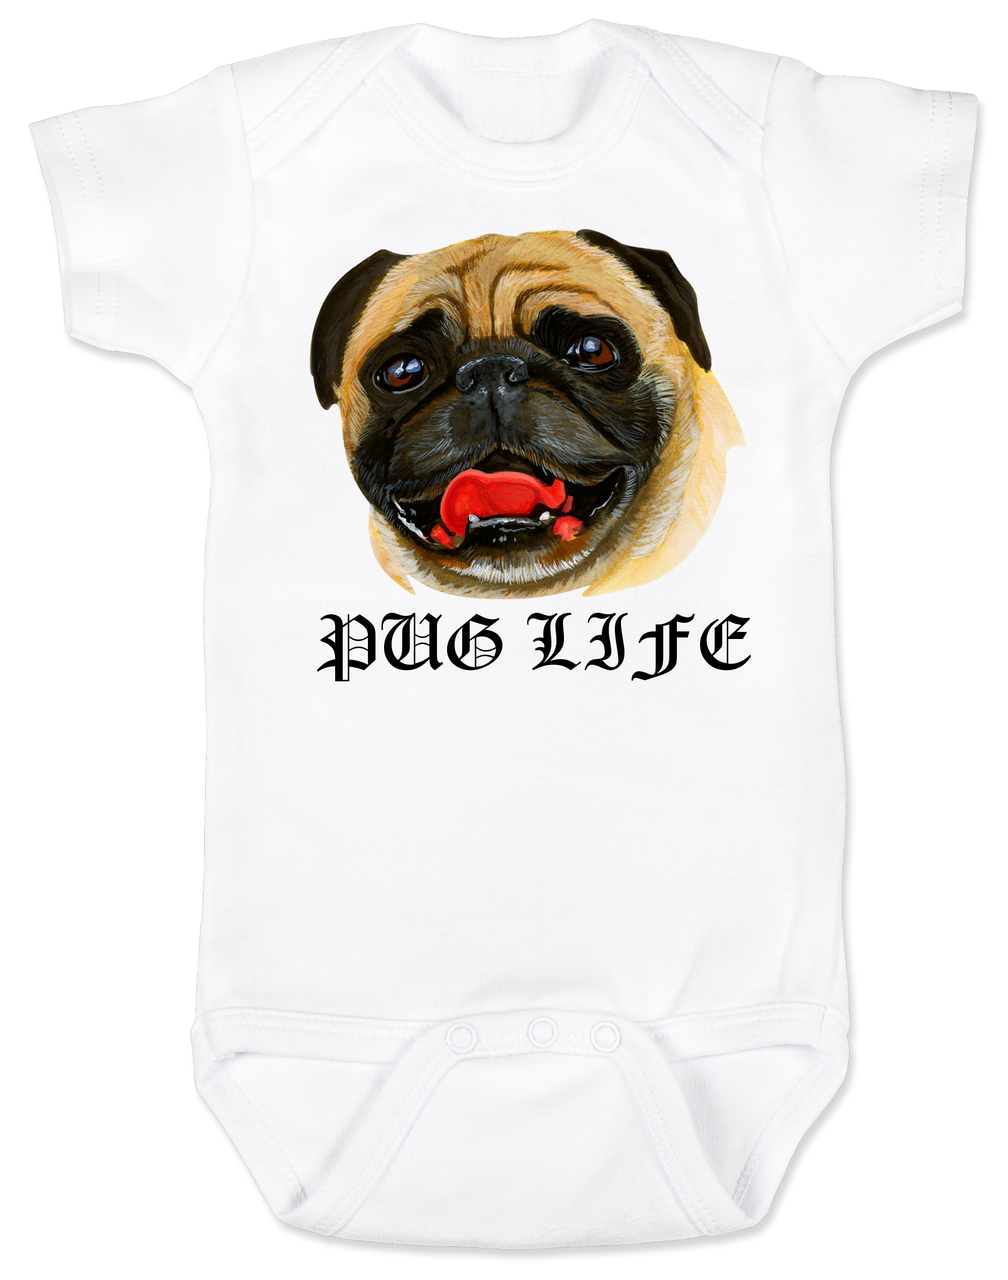 5a59441b4 Pug Life baby Bodysuit Pug Love Bodysuit Pug Bodysuit personalized dog  lover Bodysuit unique baby shower